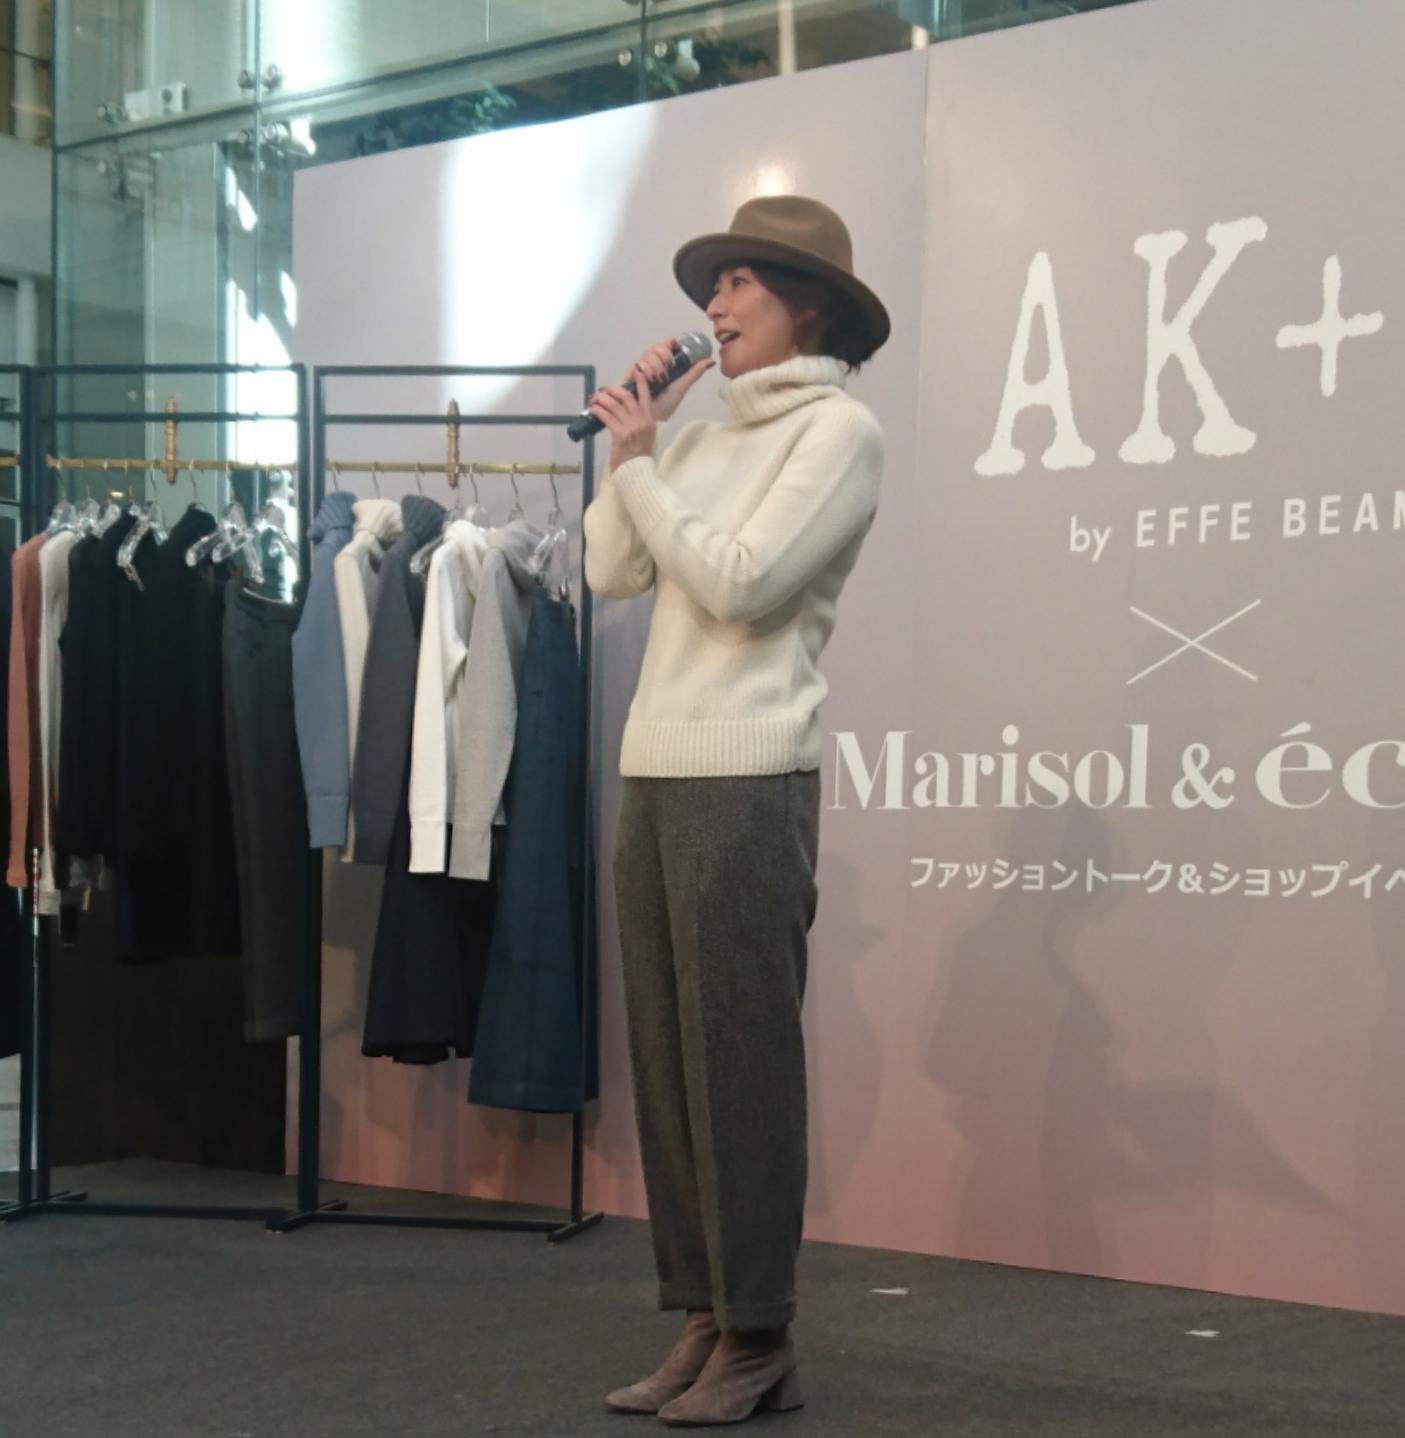 AK+1 by EFFE BEAMS×Marisol&eclatスペシャルイベント@丸ビル_1_1-1